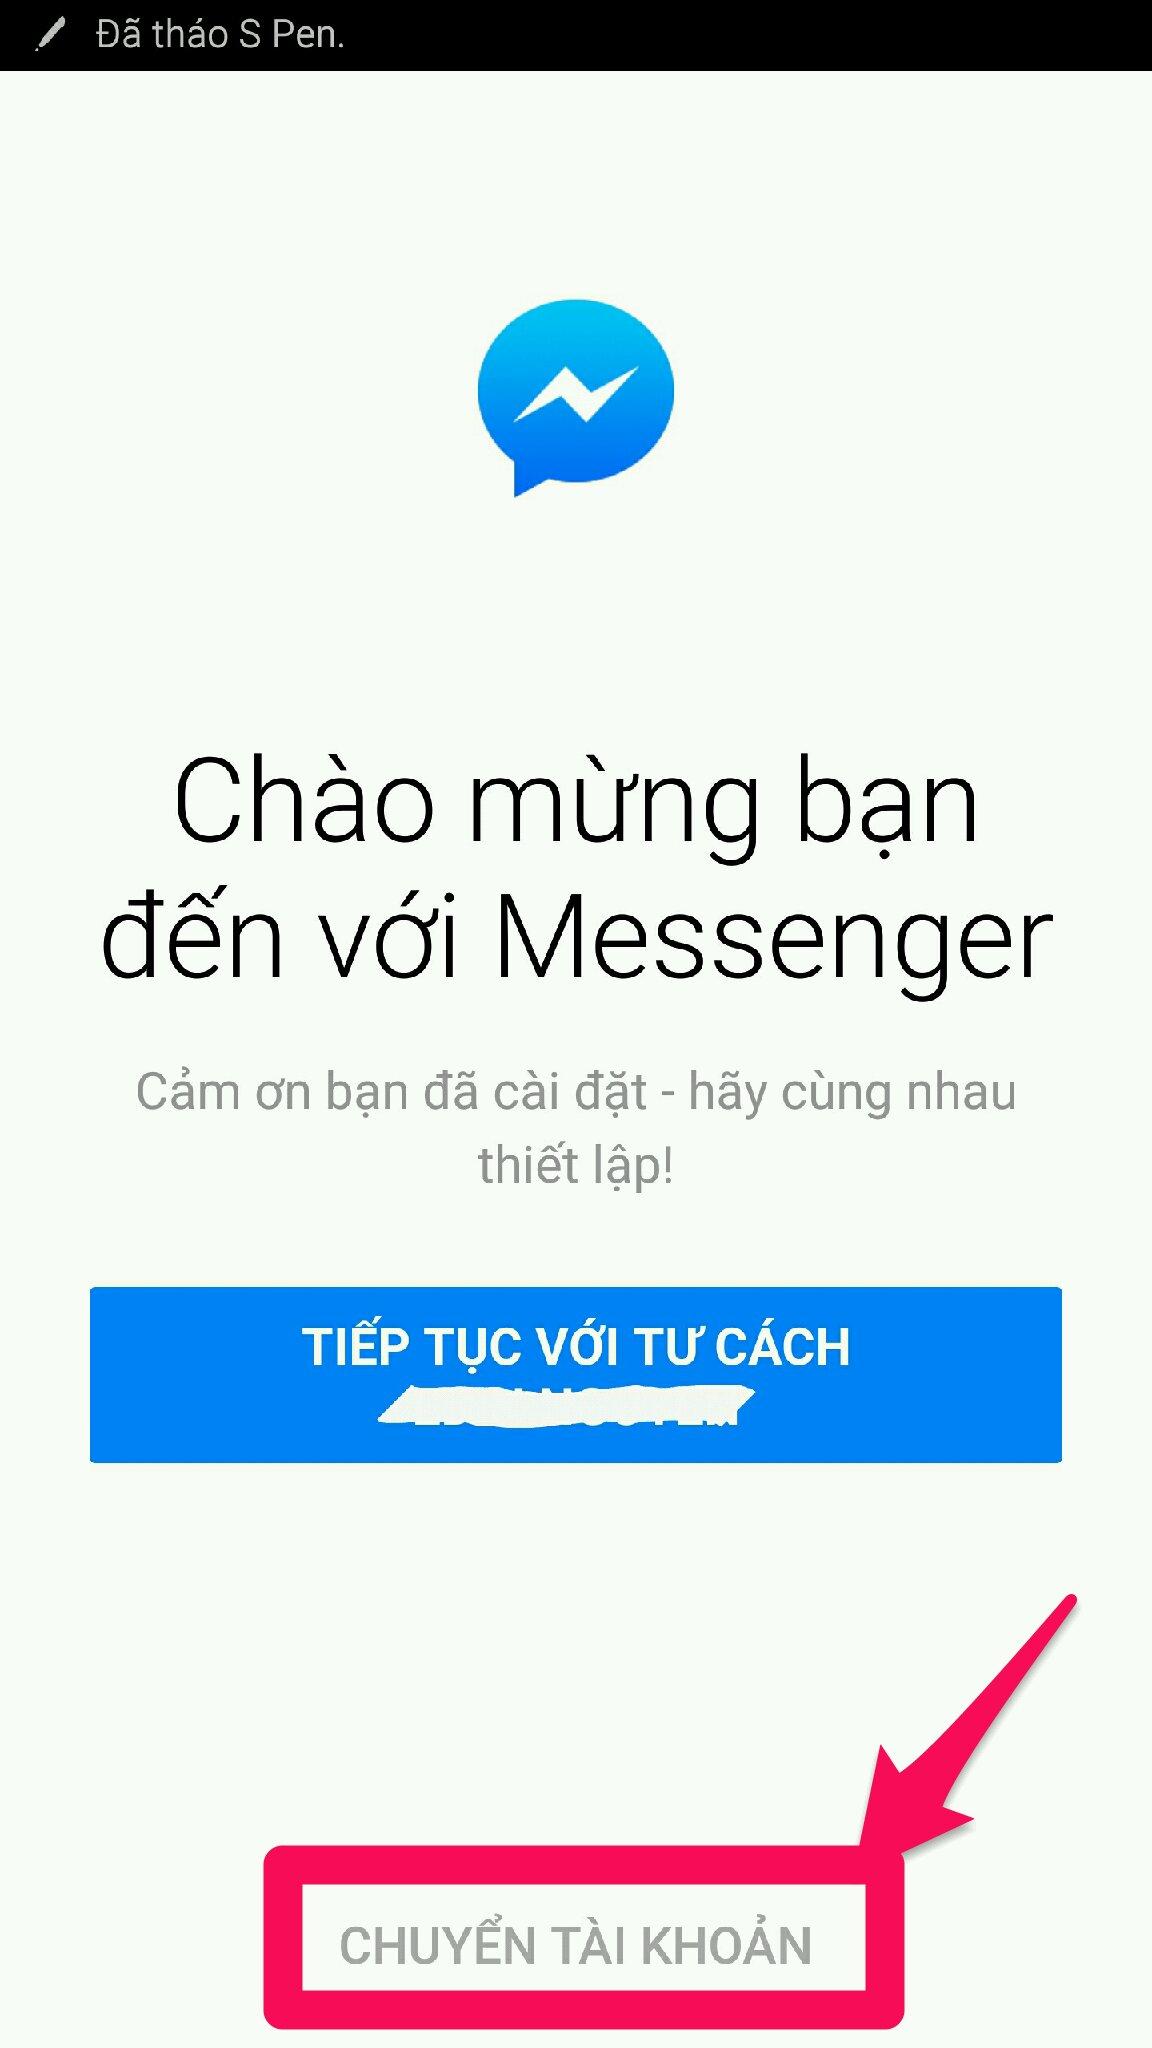 ứng dụng Messenge